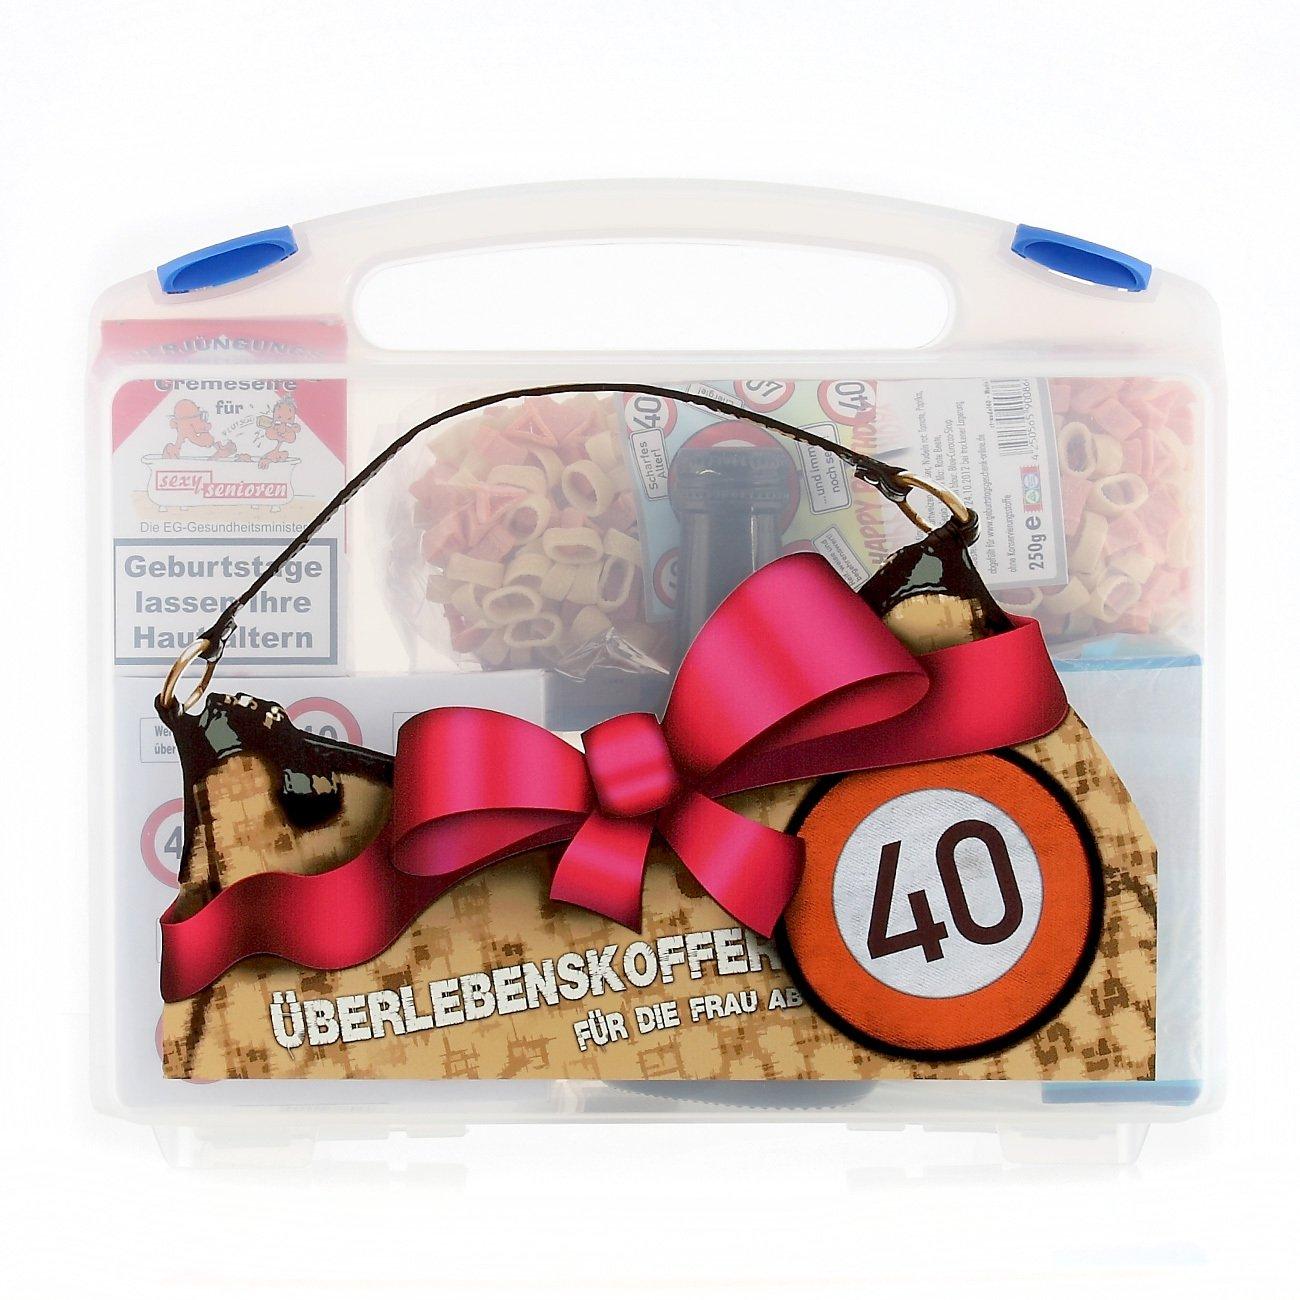 Lustige Apotheke Überlebenskoffer für die Frau ab 40 (8 teilig) Lustapotheke®